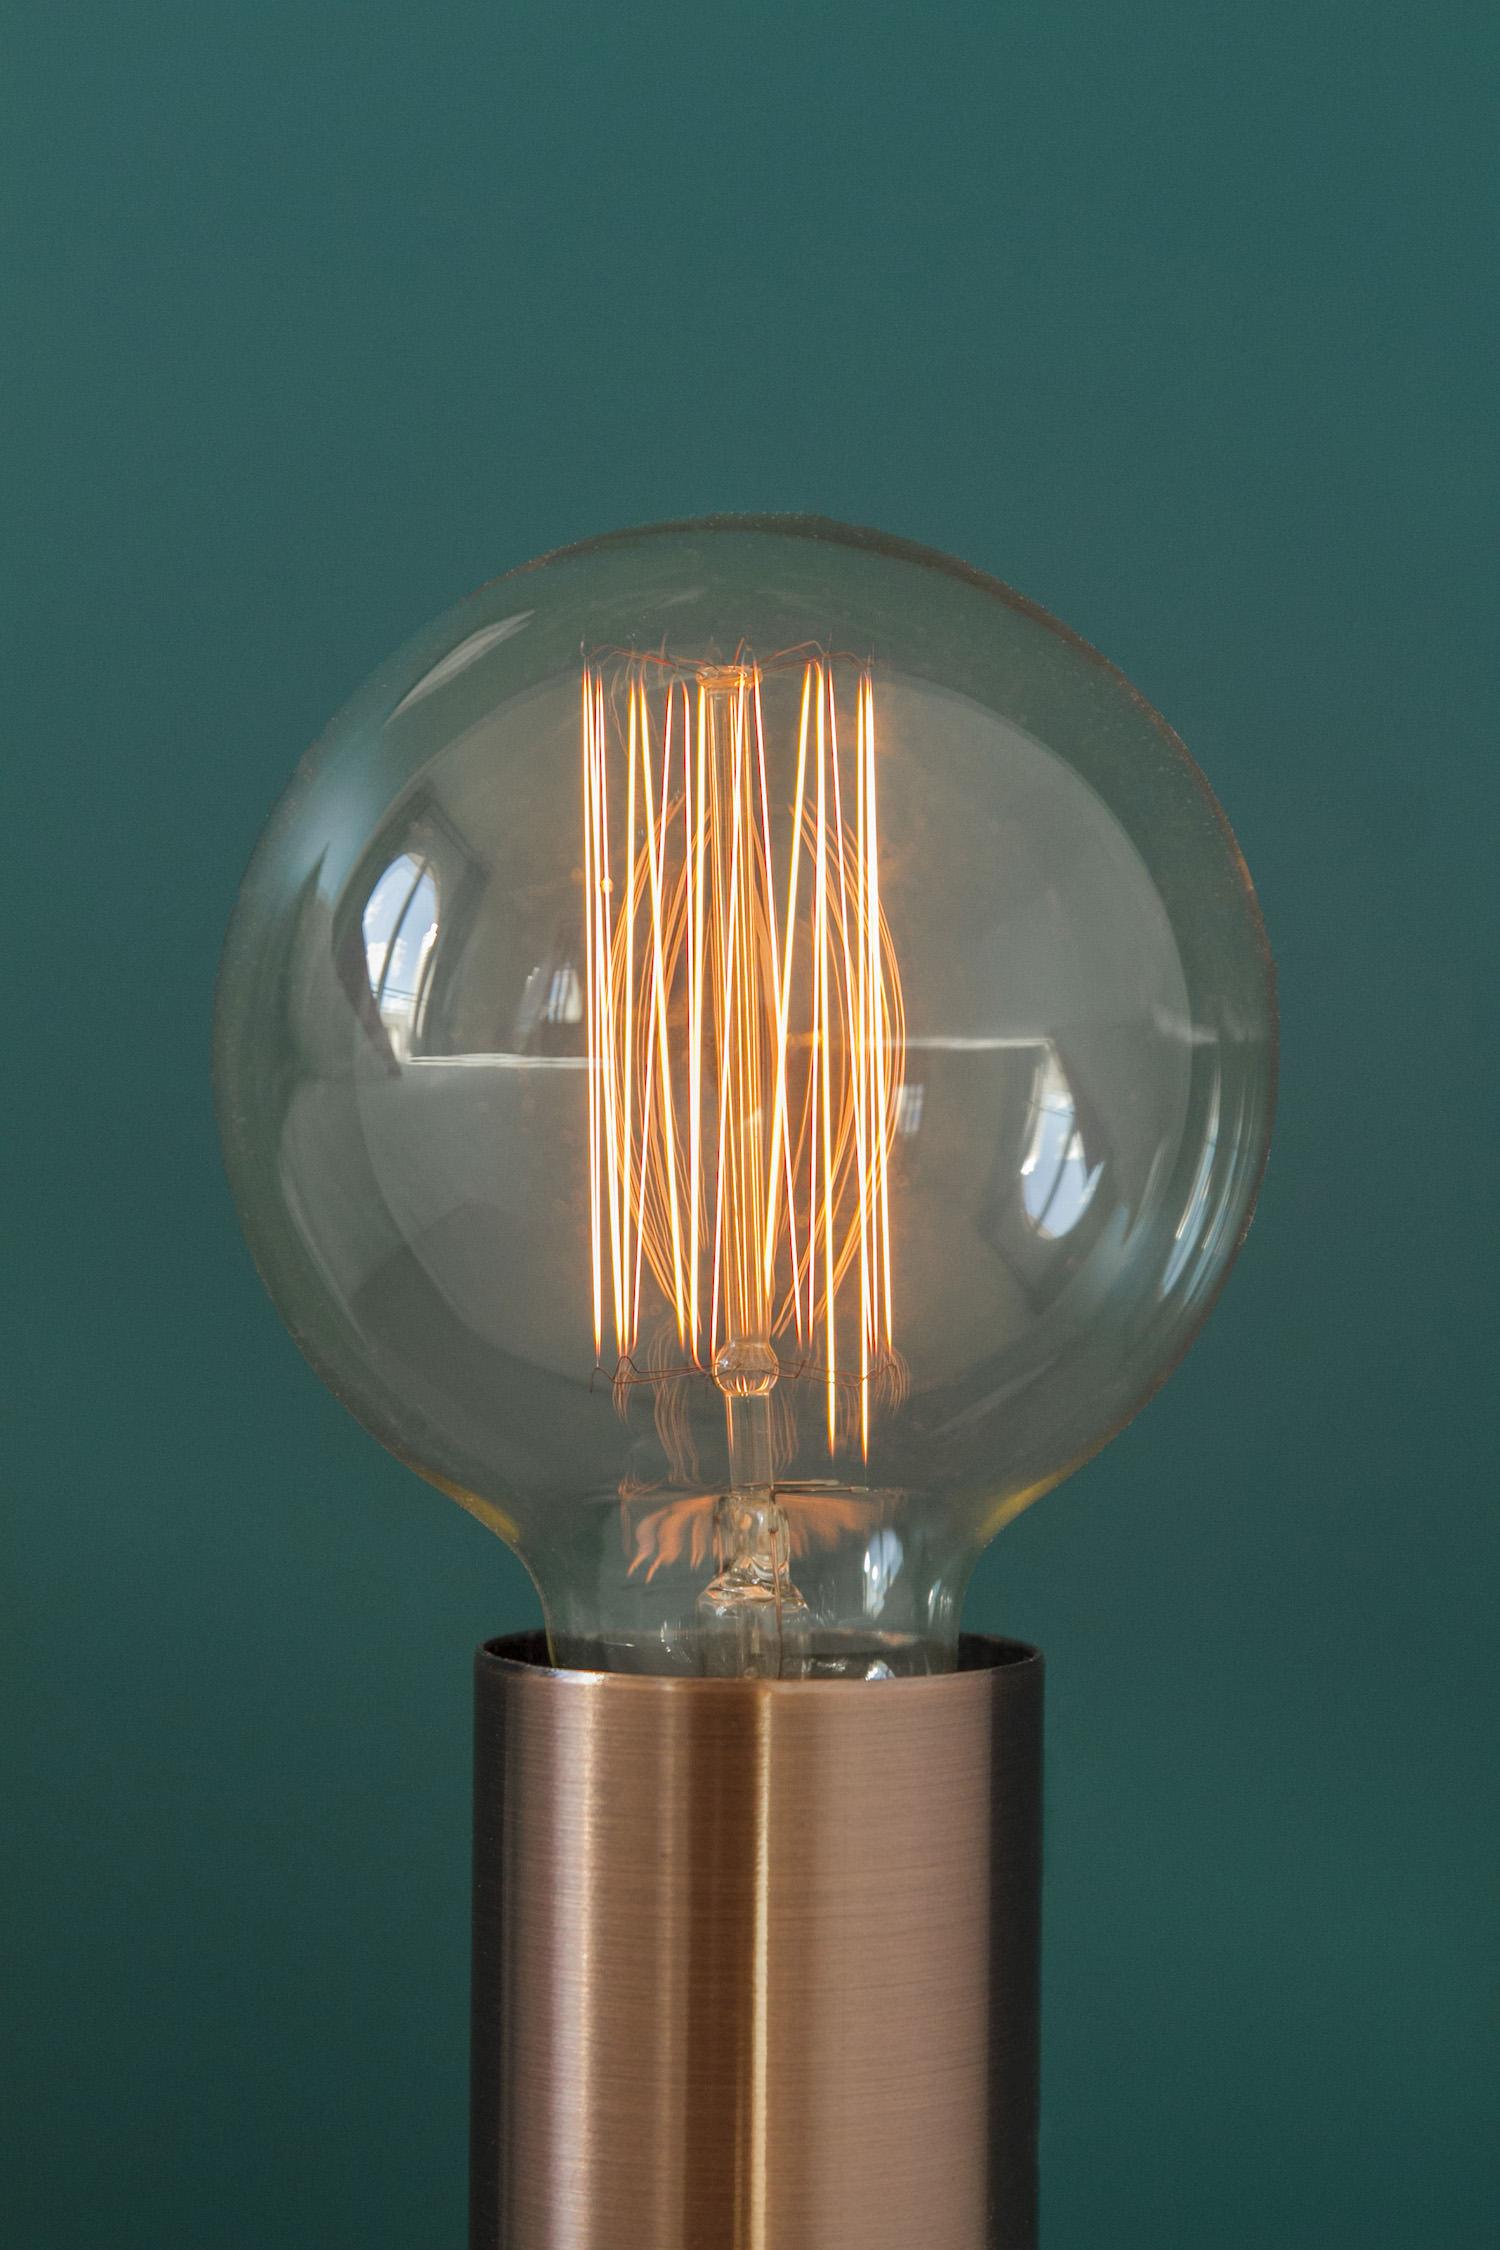 Chambre Zoom Lampe chevet.jpg